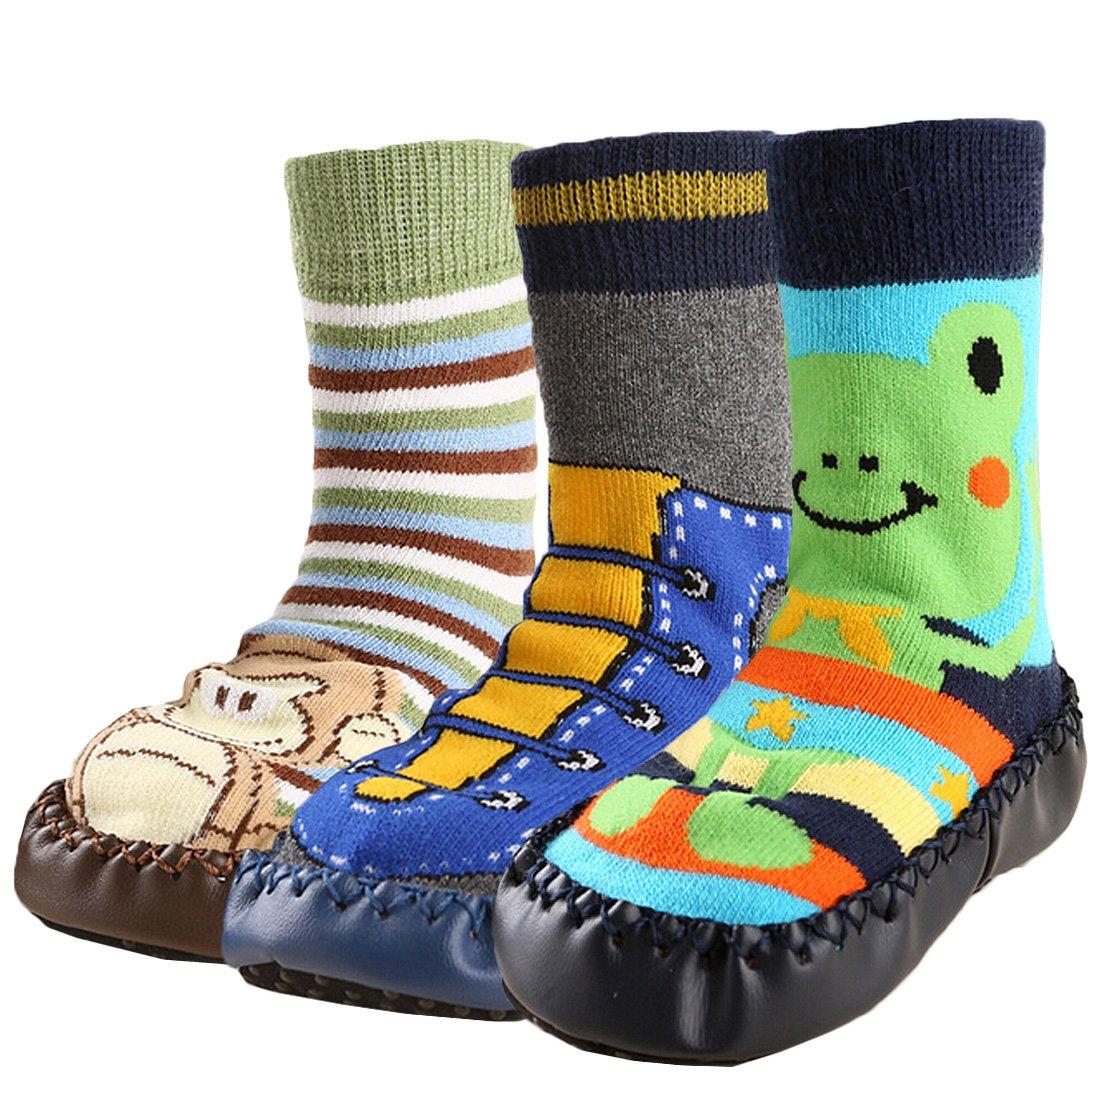 KF Baby Toddlers Boys Girls Non-Skid Slipper Socks Value Pack [3 Pairs]